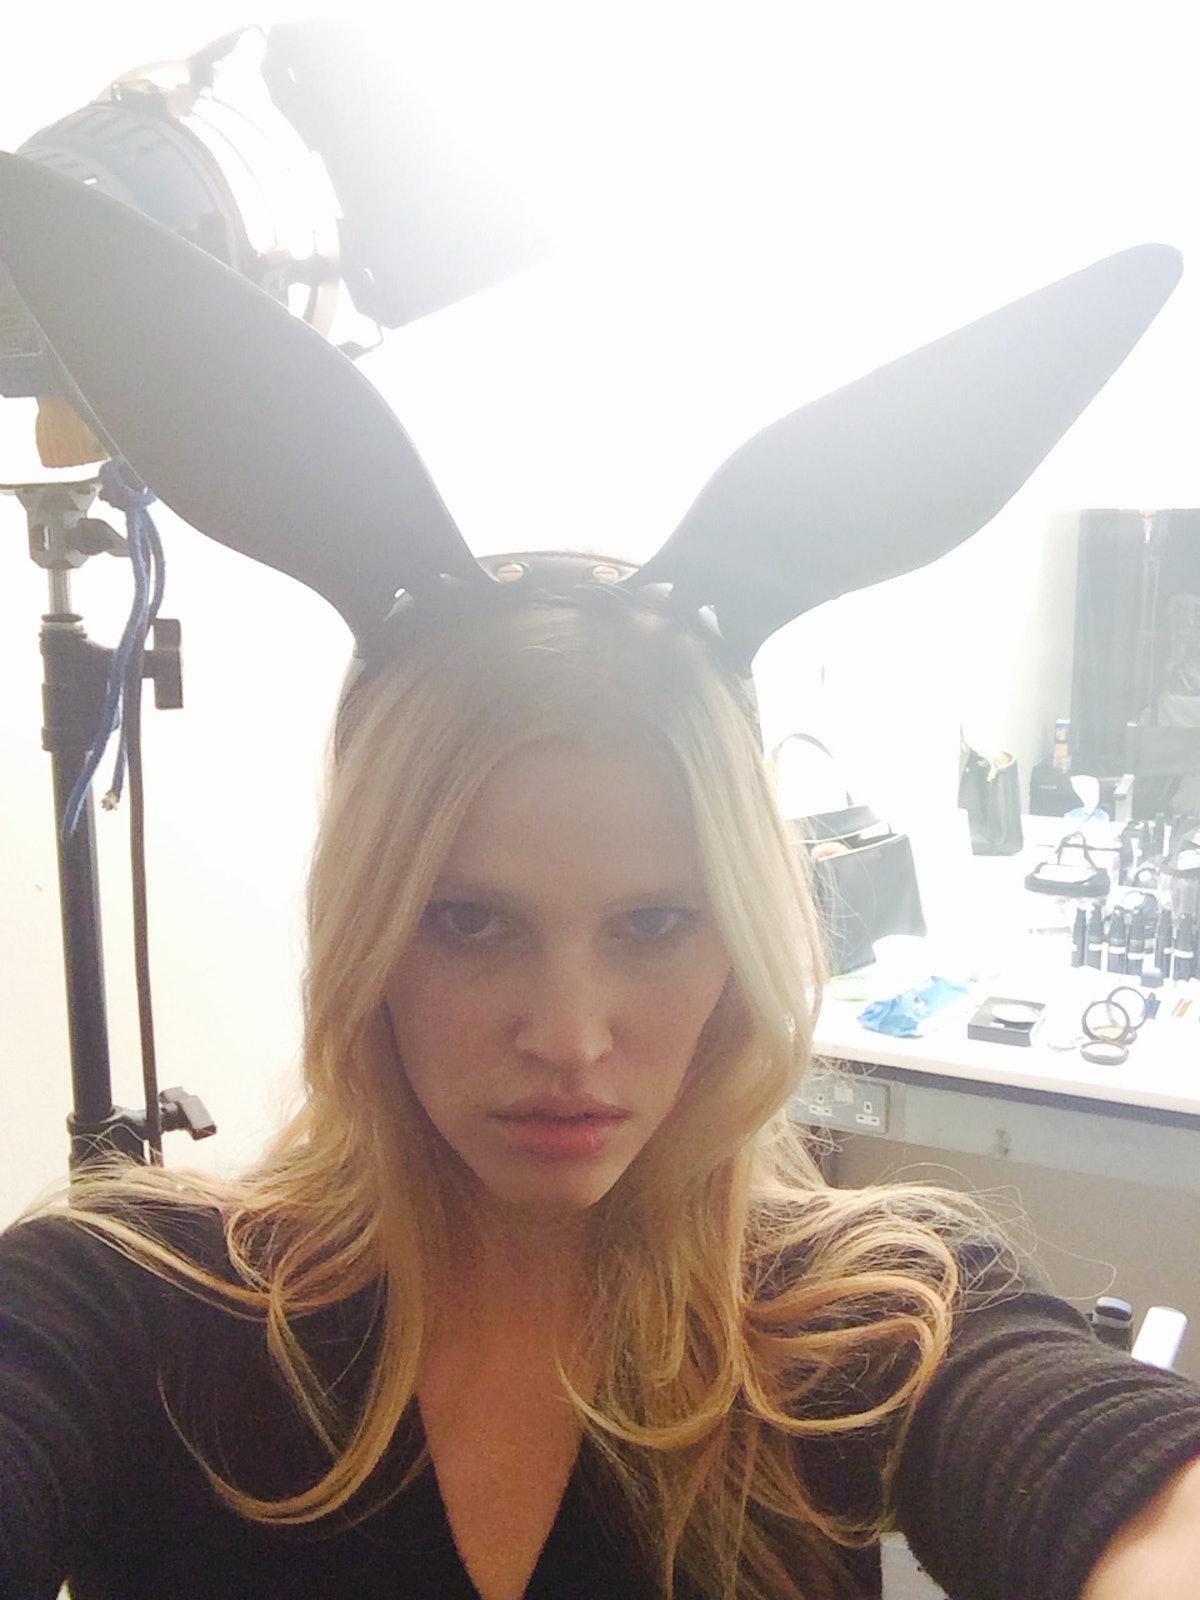 lara stone selfie